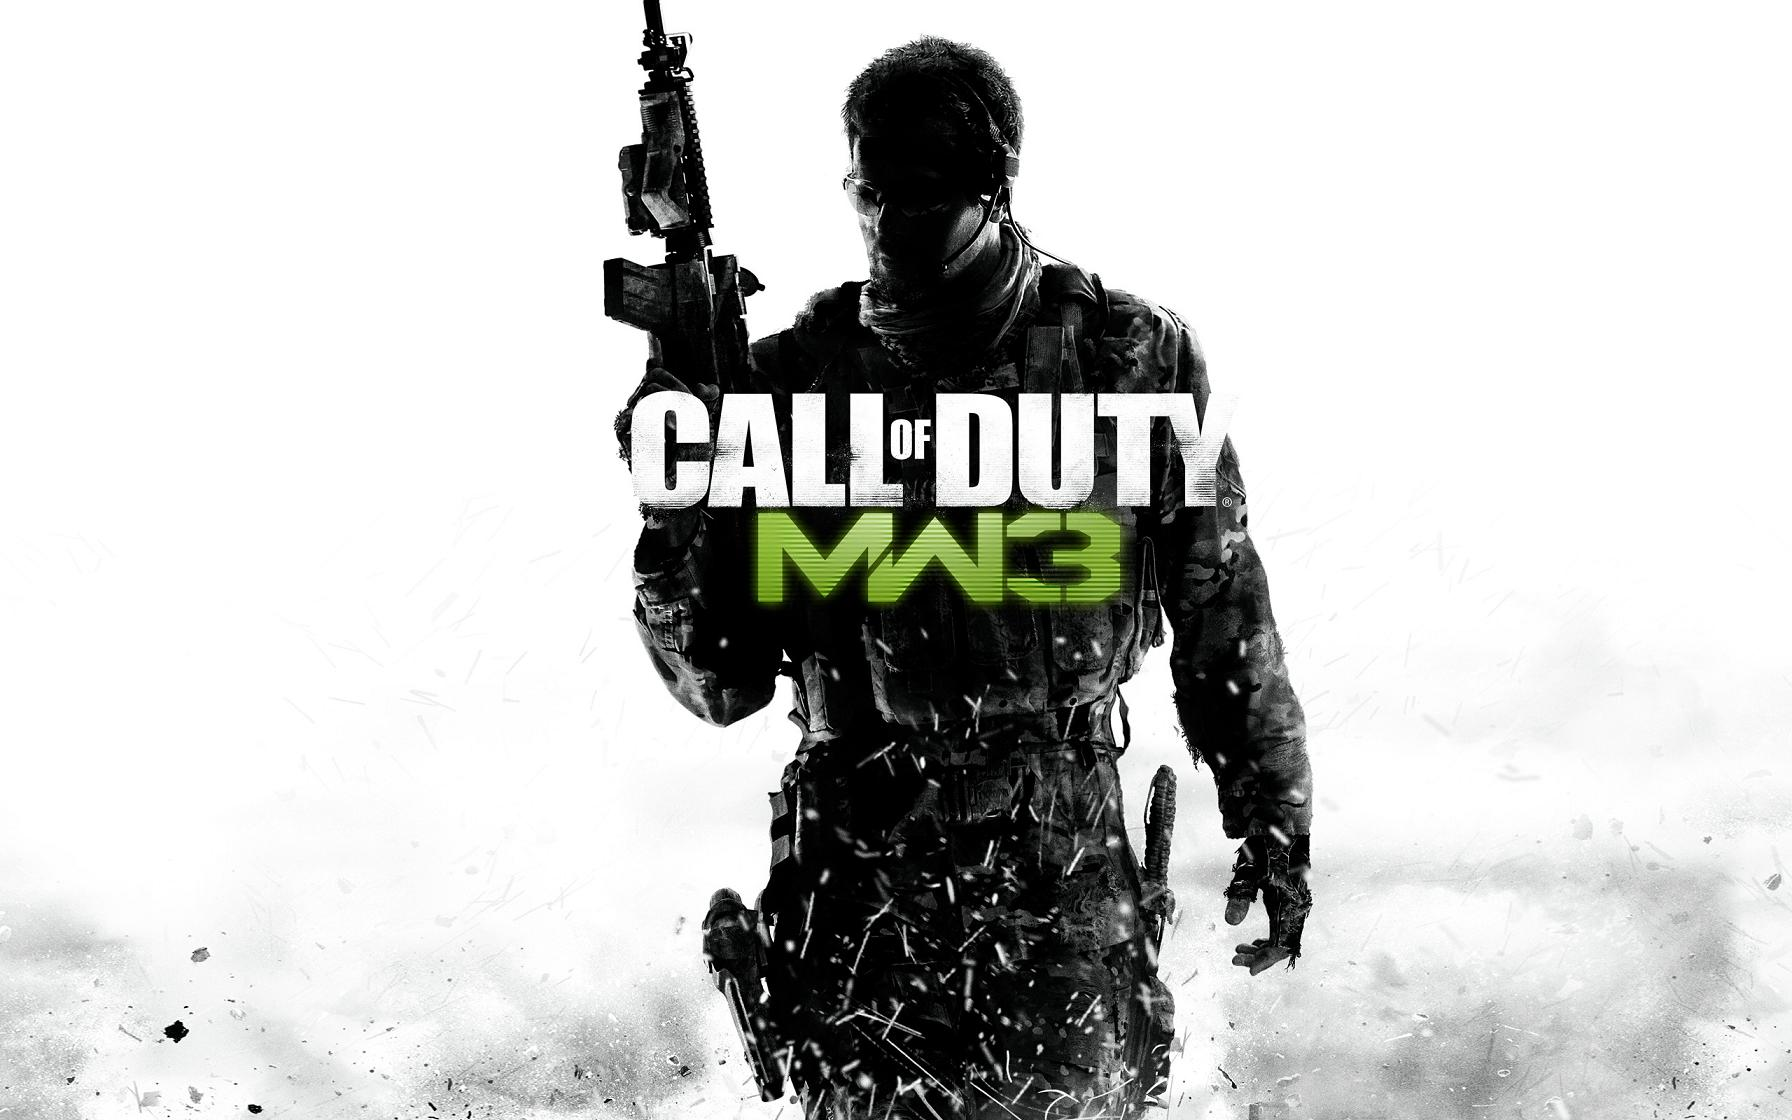 Call-of-Duty-Wallpaper-Desktop_5